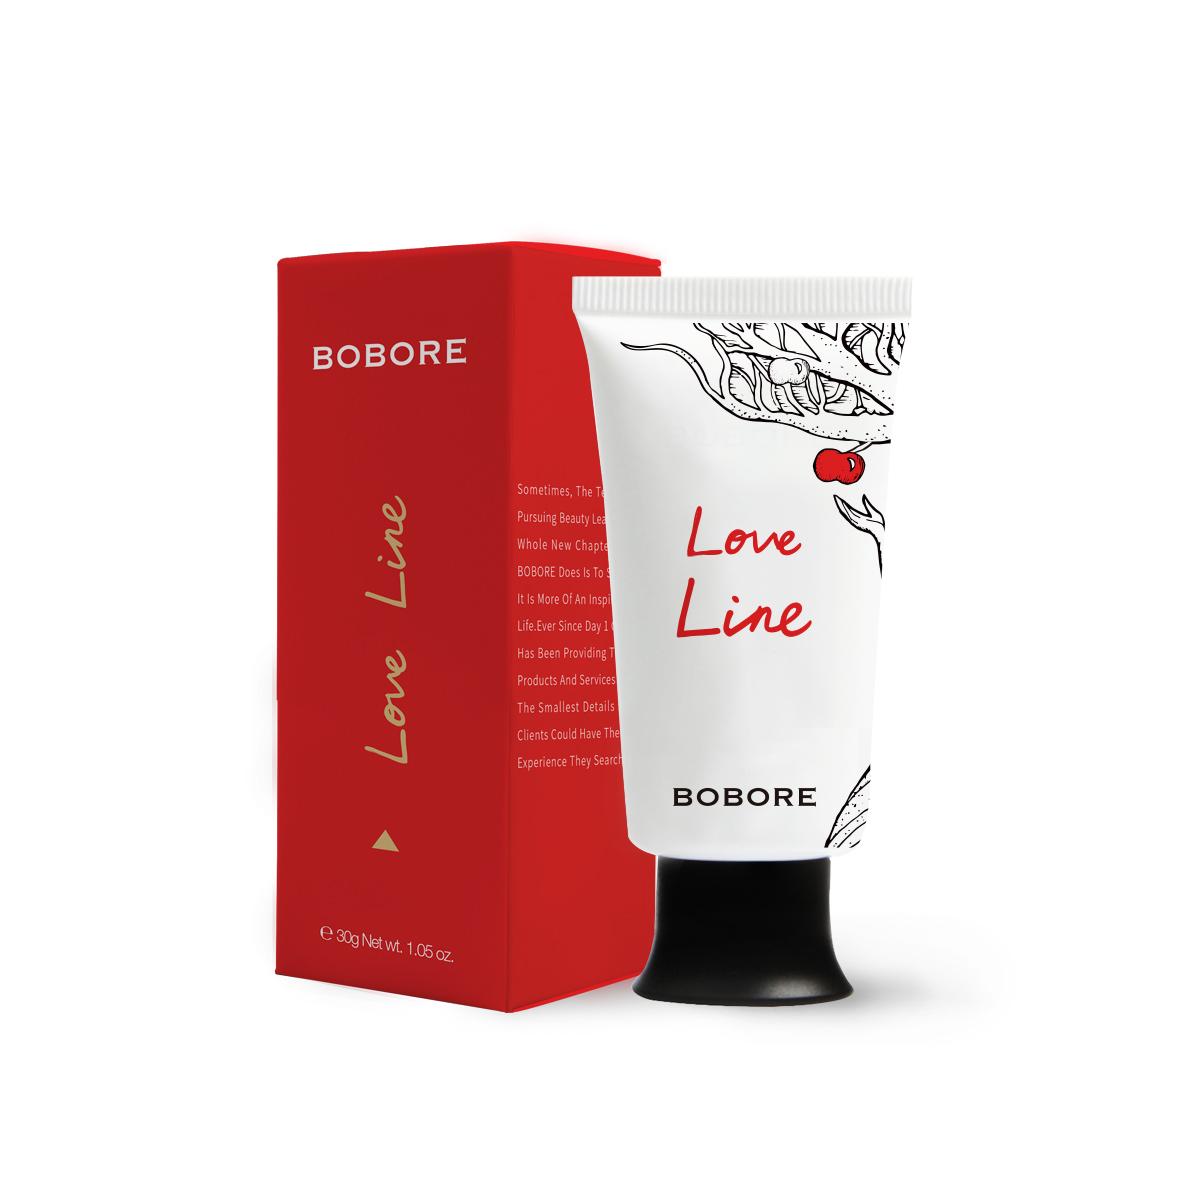 【BOBORE】Love Line 海洋酵母柔润香氛护手霜